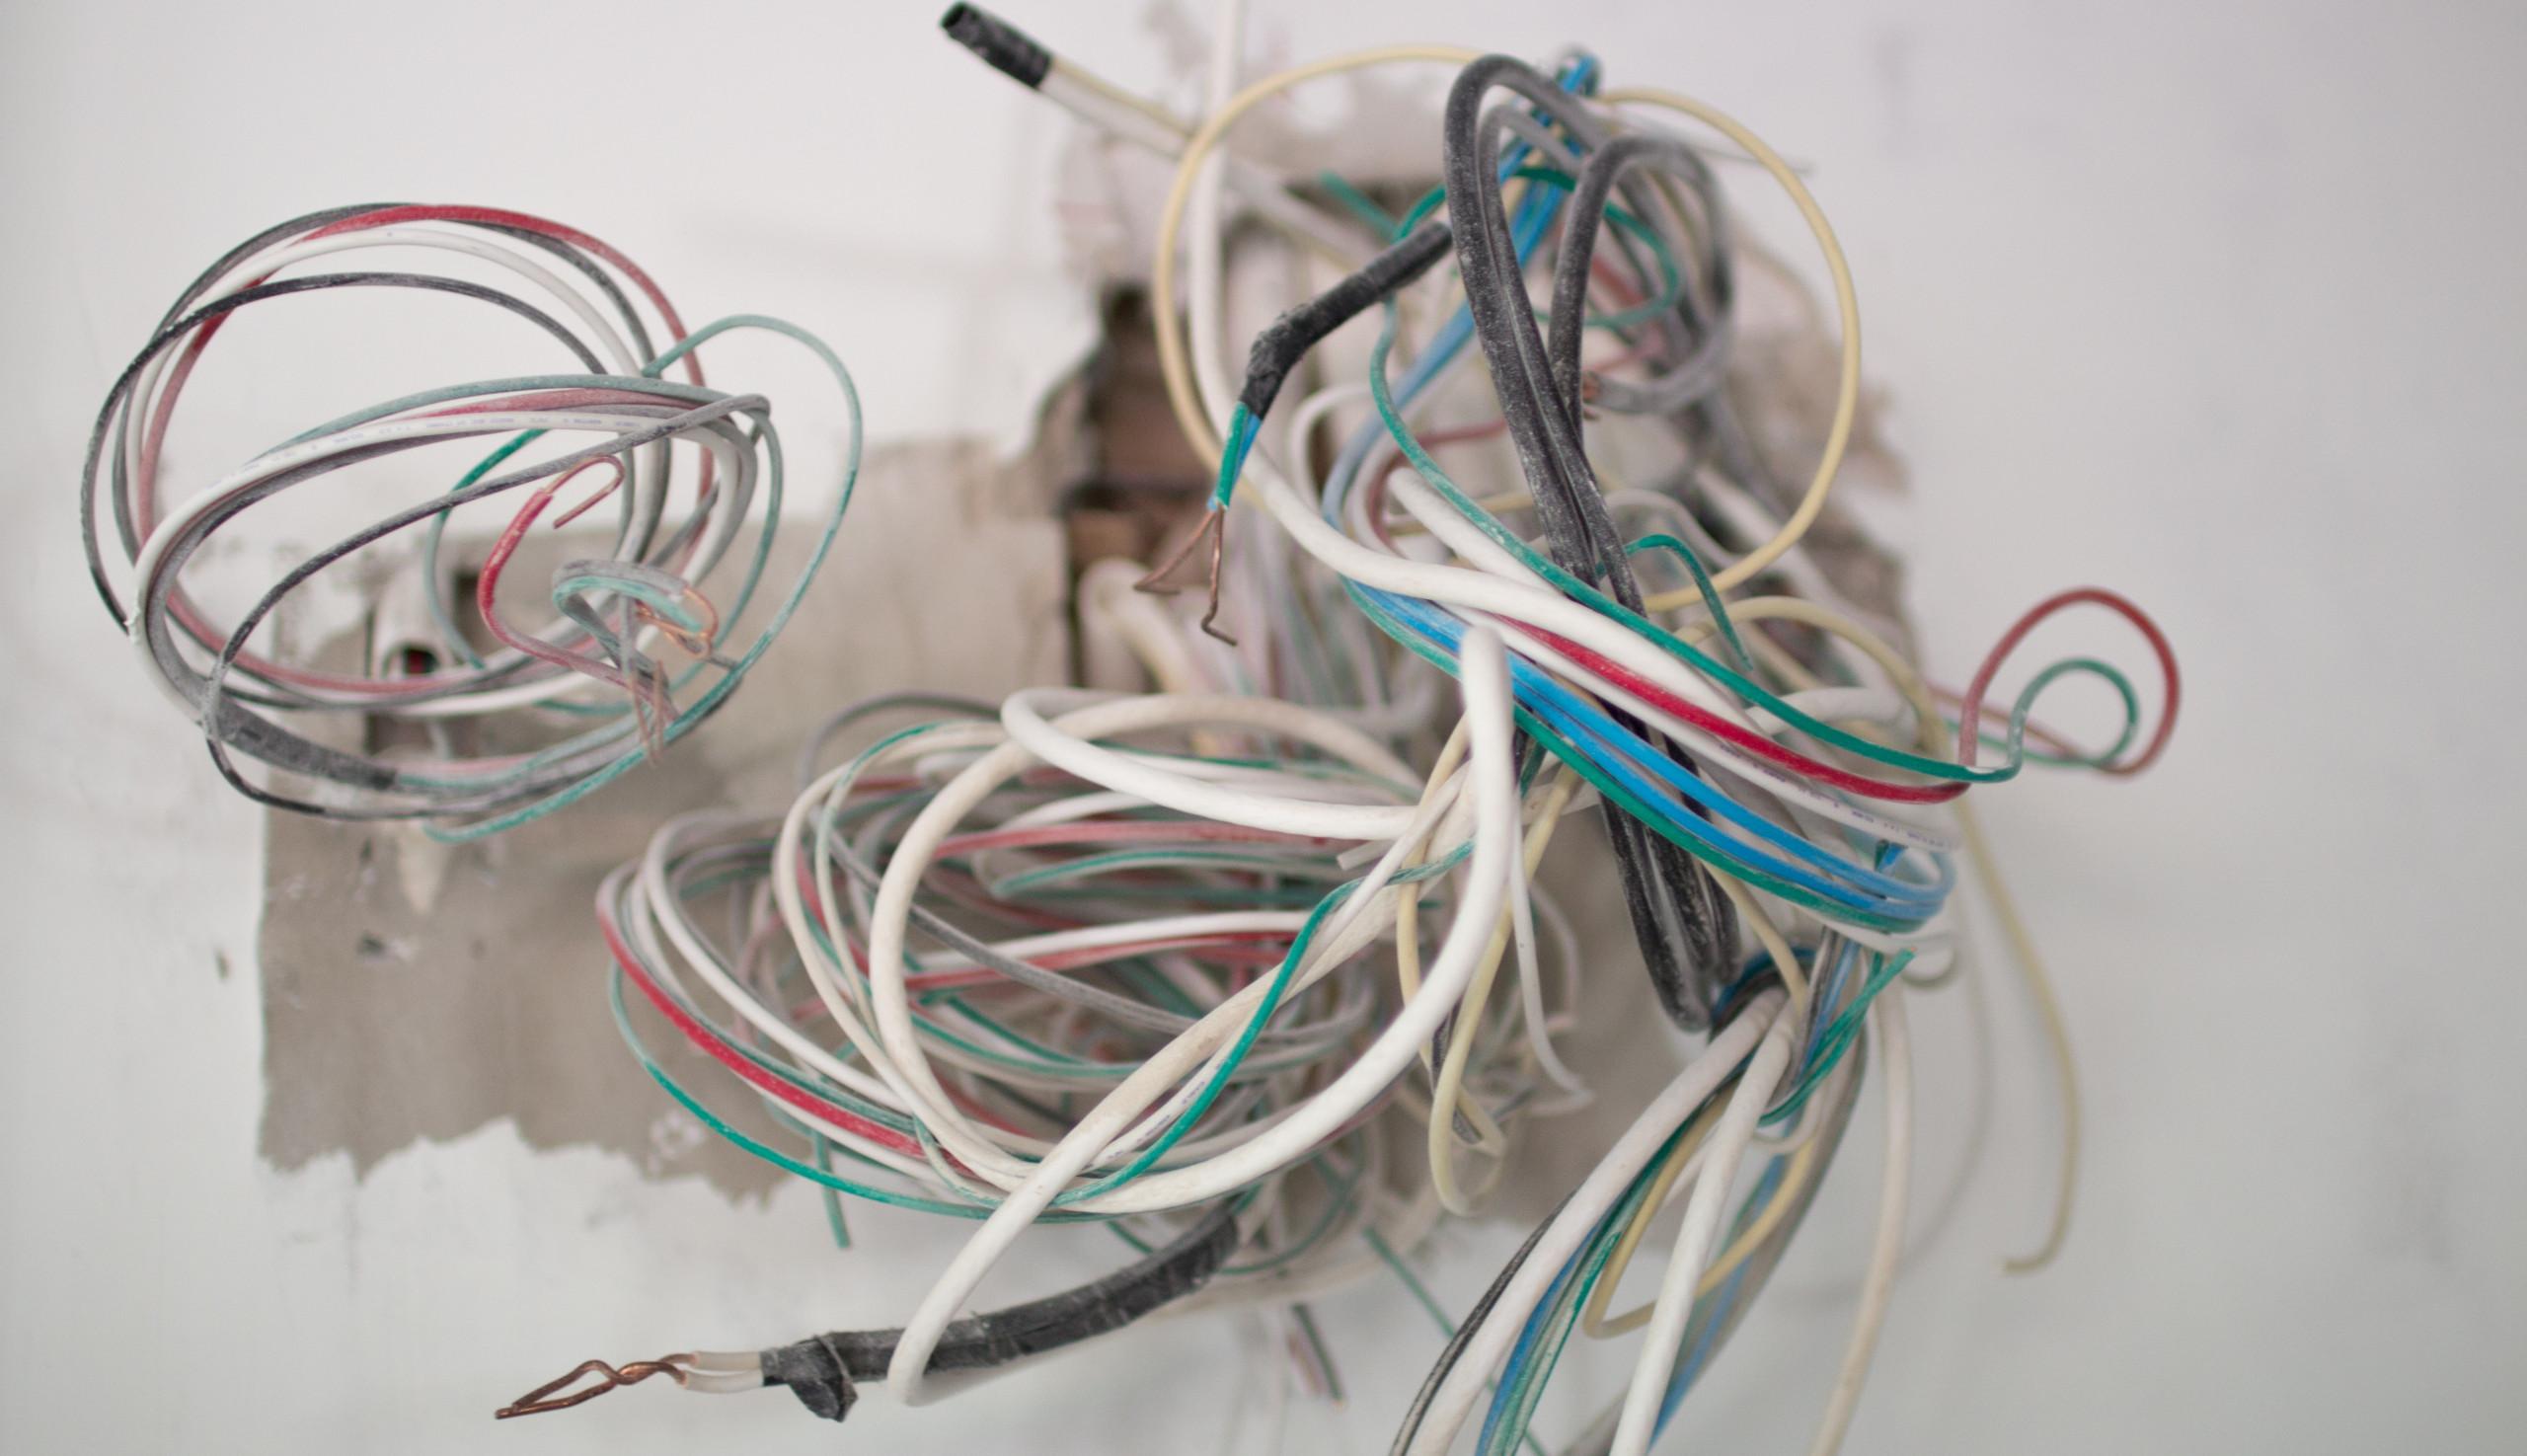 fios-energia-elétrica